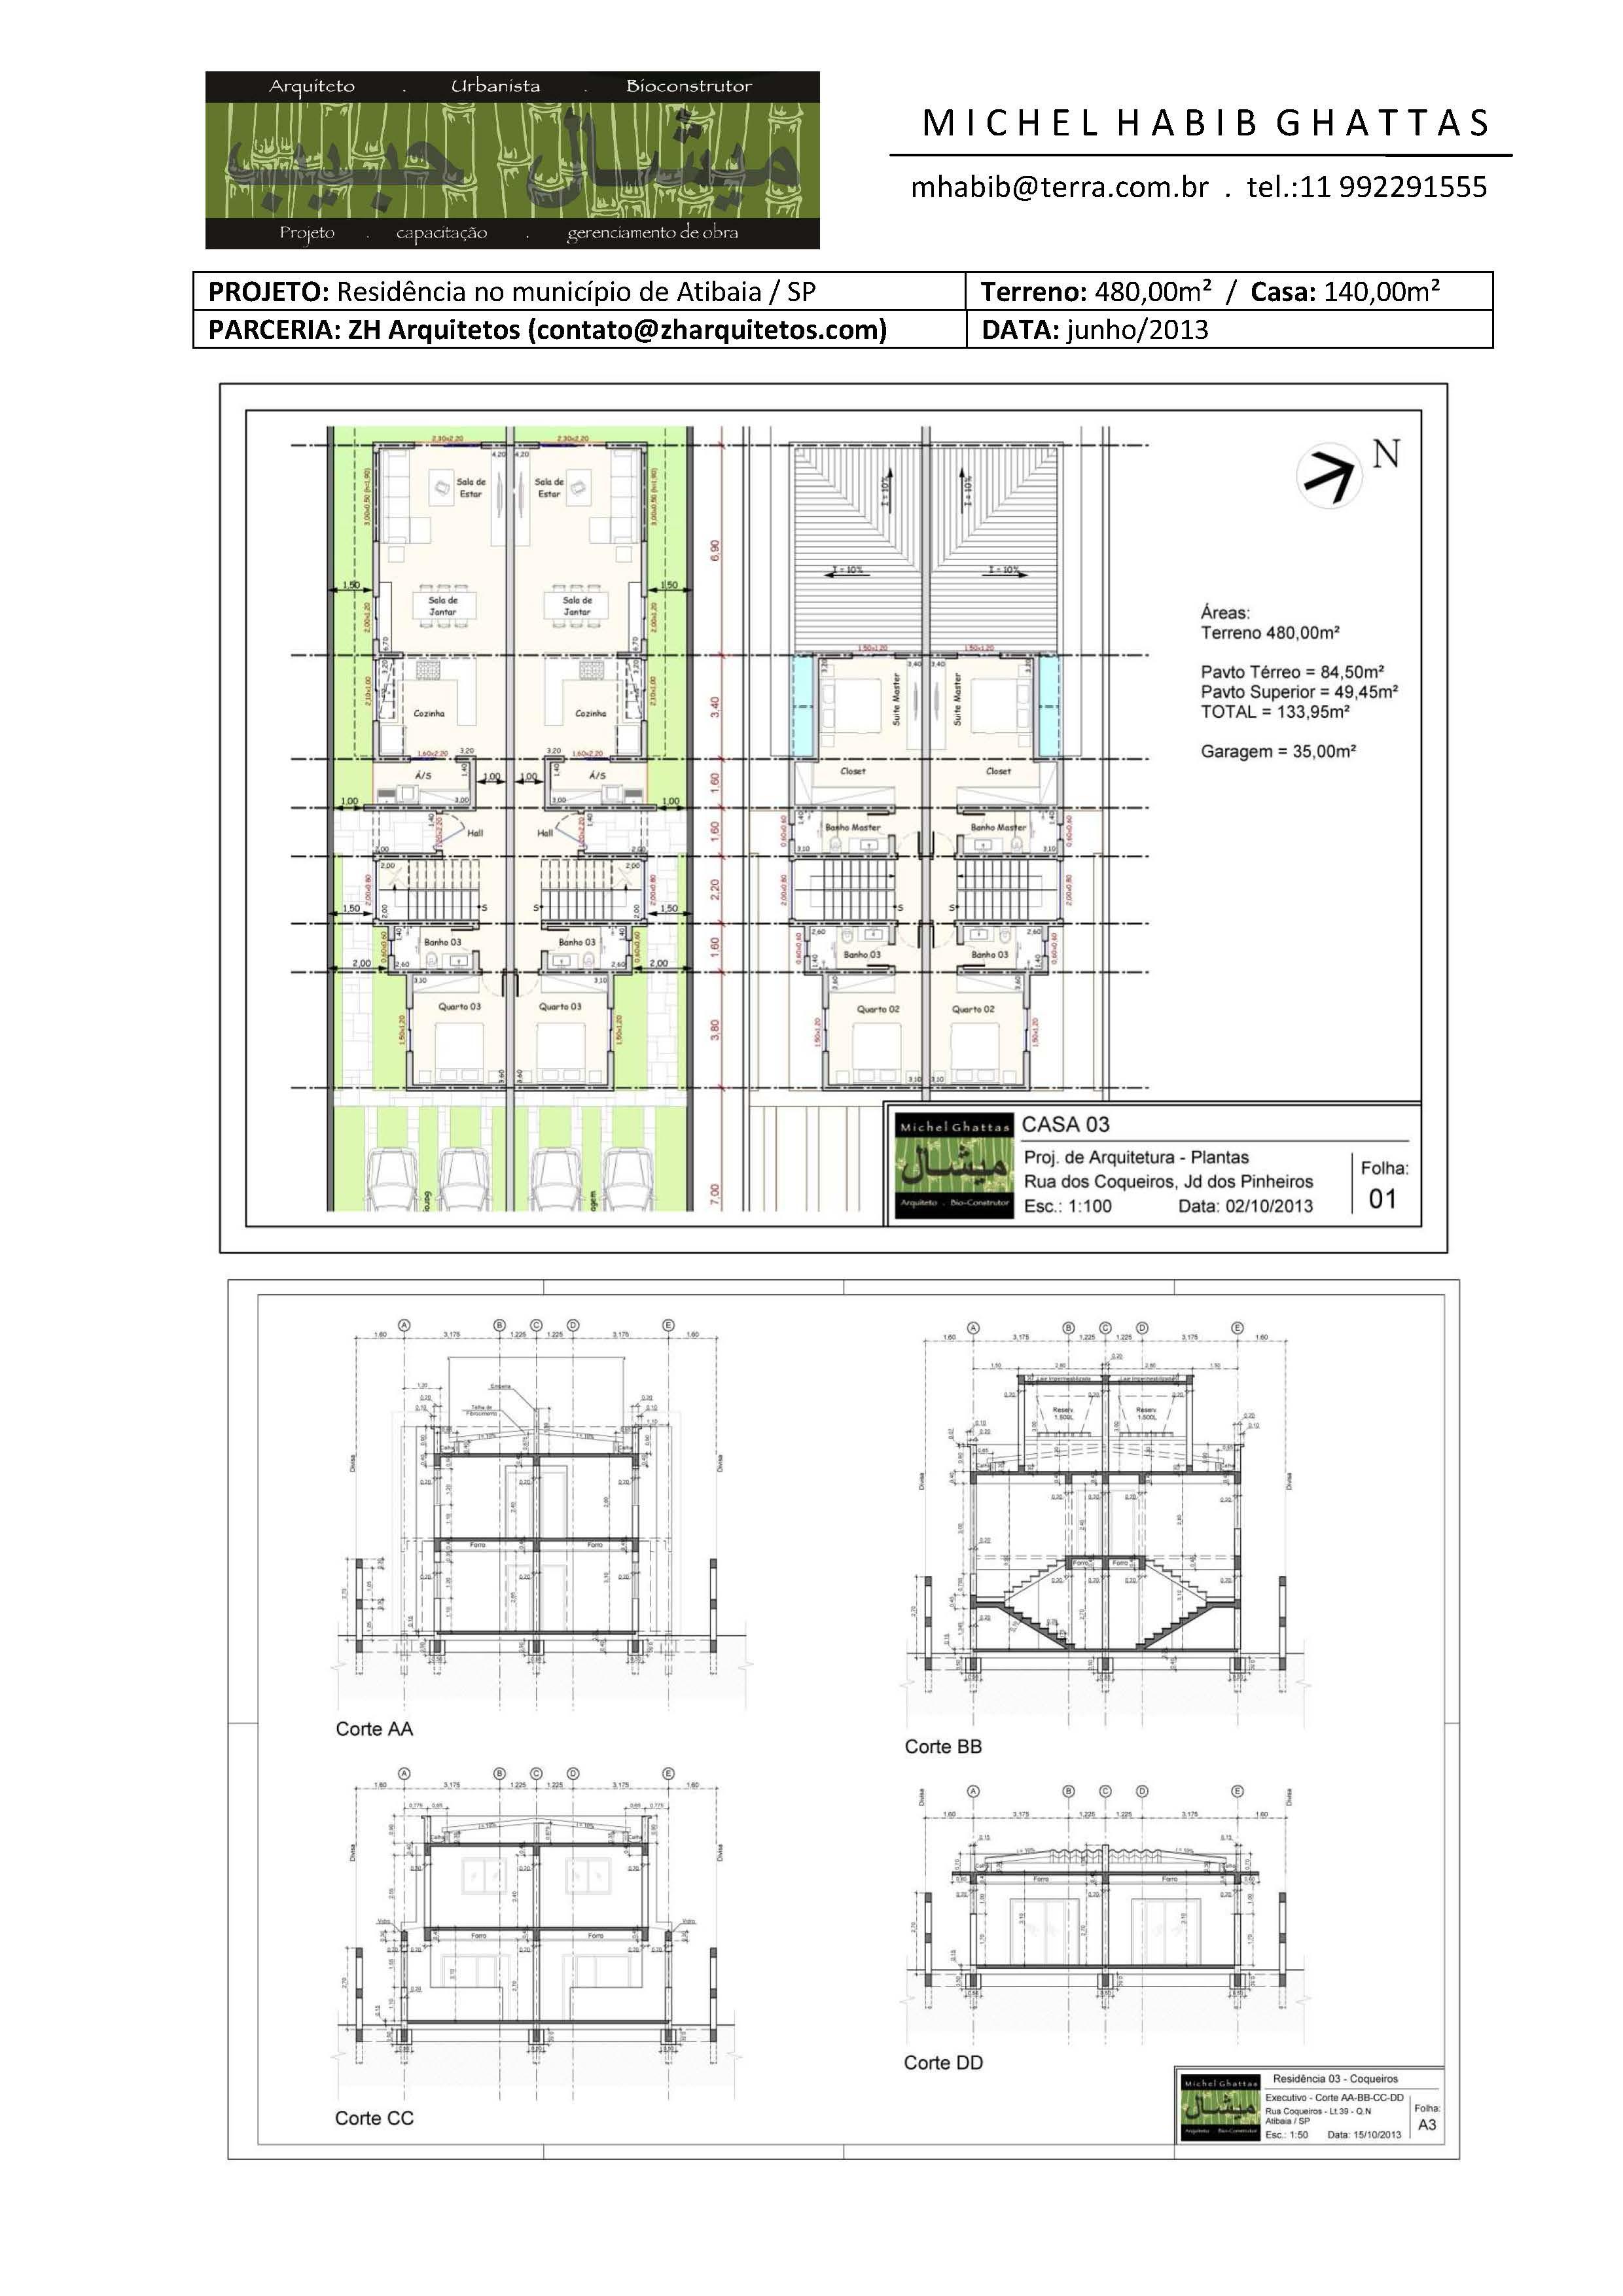 zh.arquitetos - Atibaia 2014